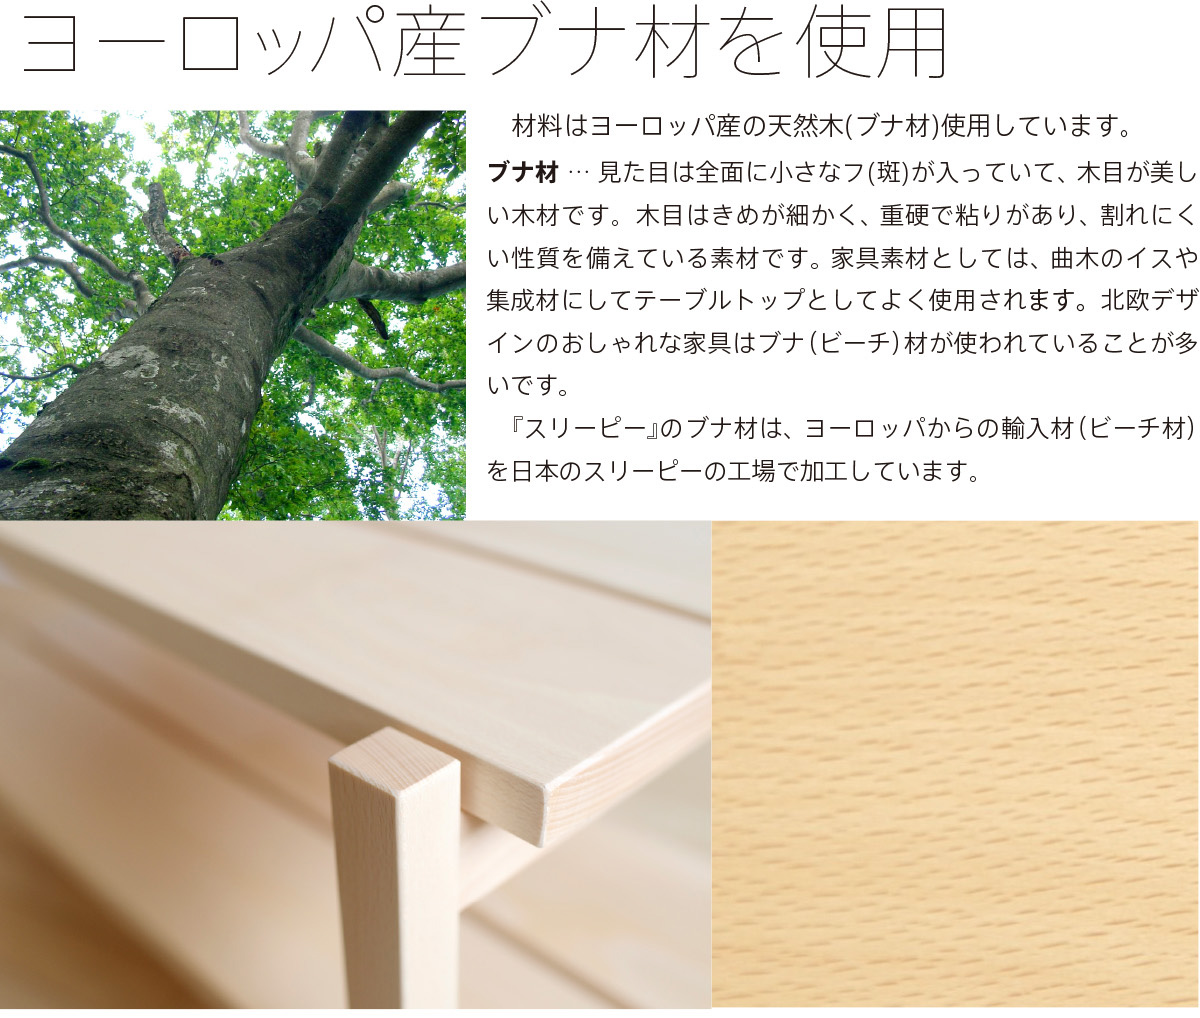 ※※※ B品 ※※※ 木製「ベンチシェルフ」※材料の赤みが強いためナチュラル色の色が写真と変わります